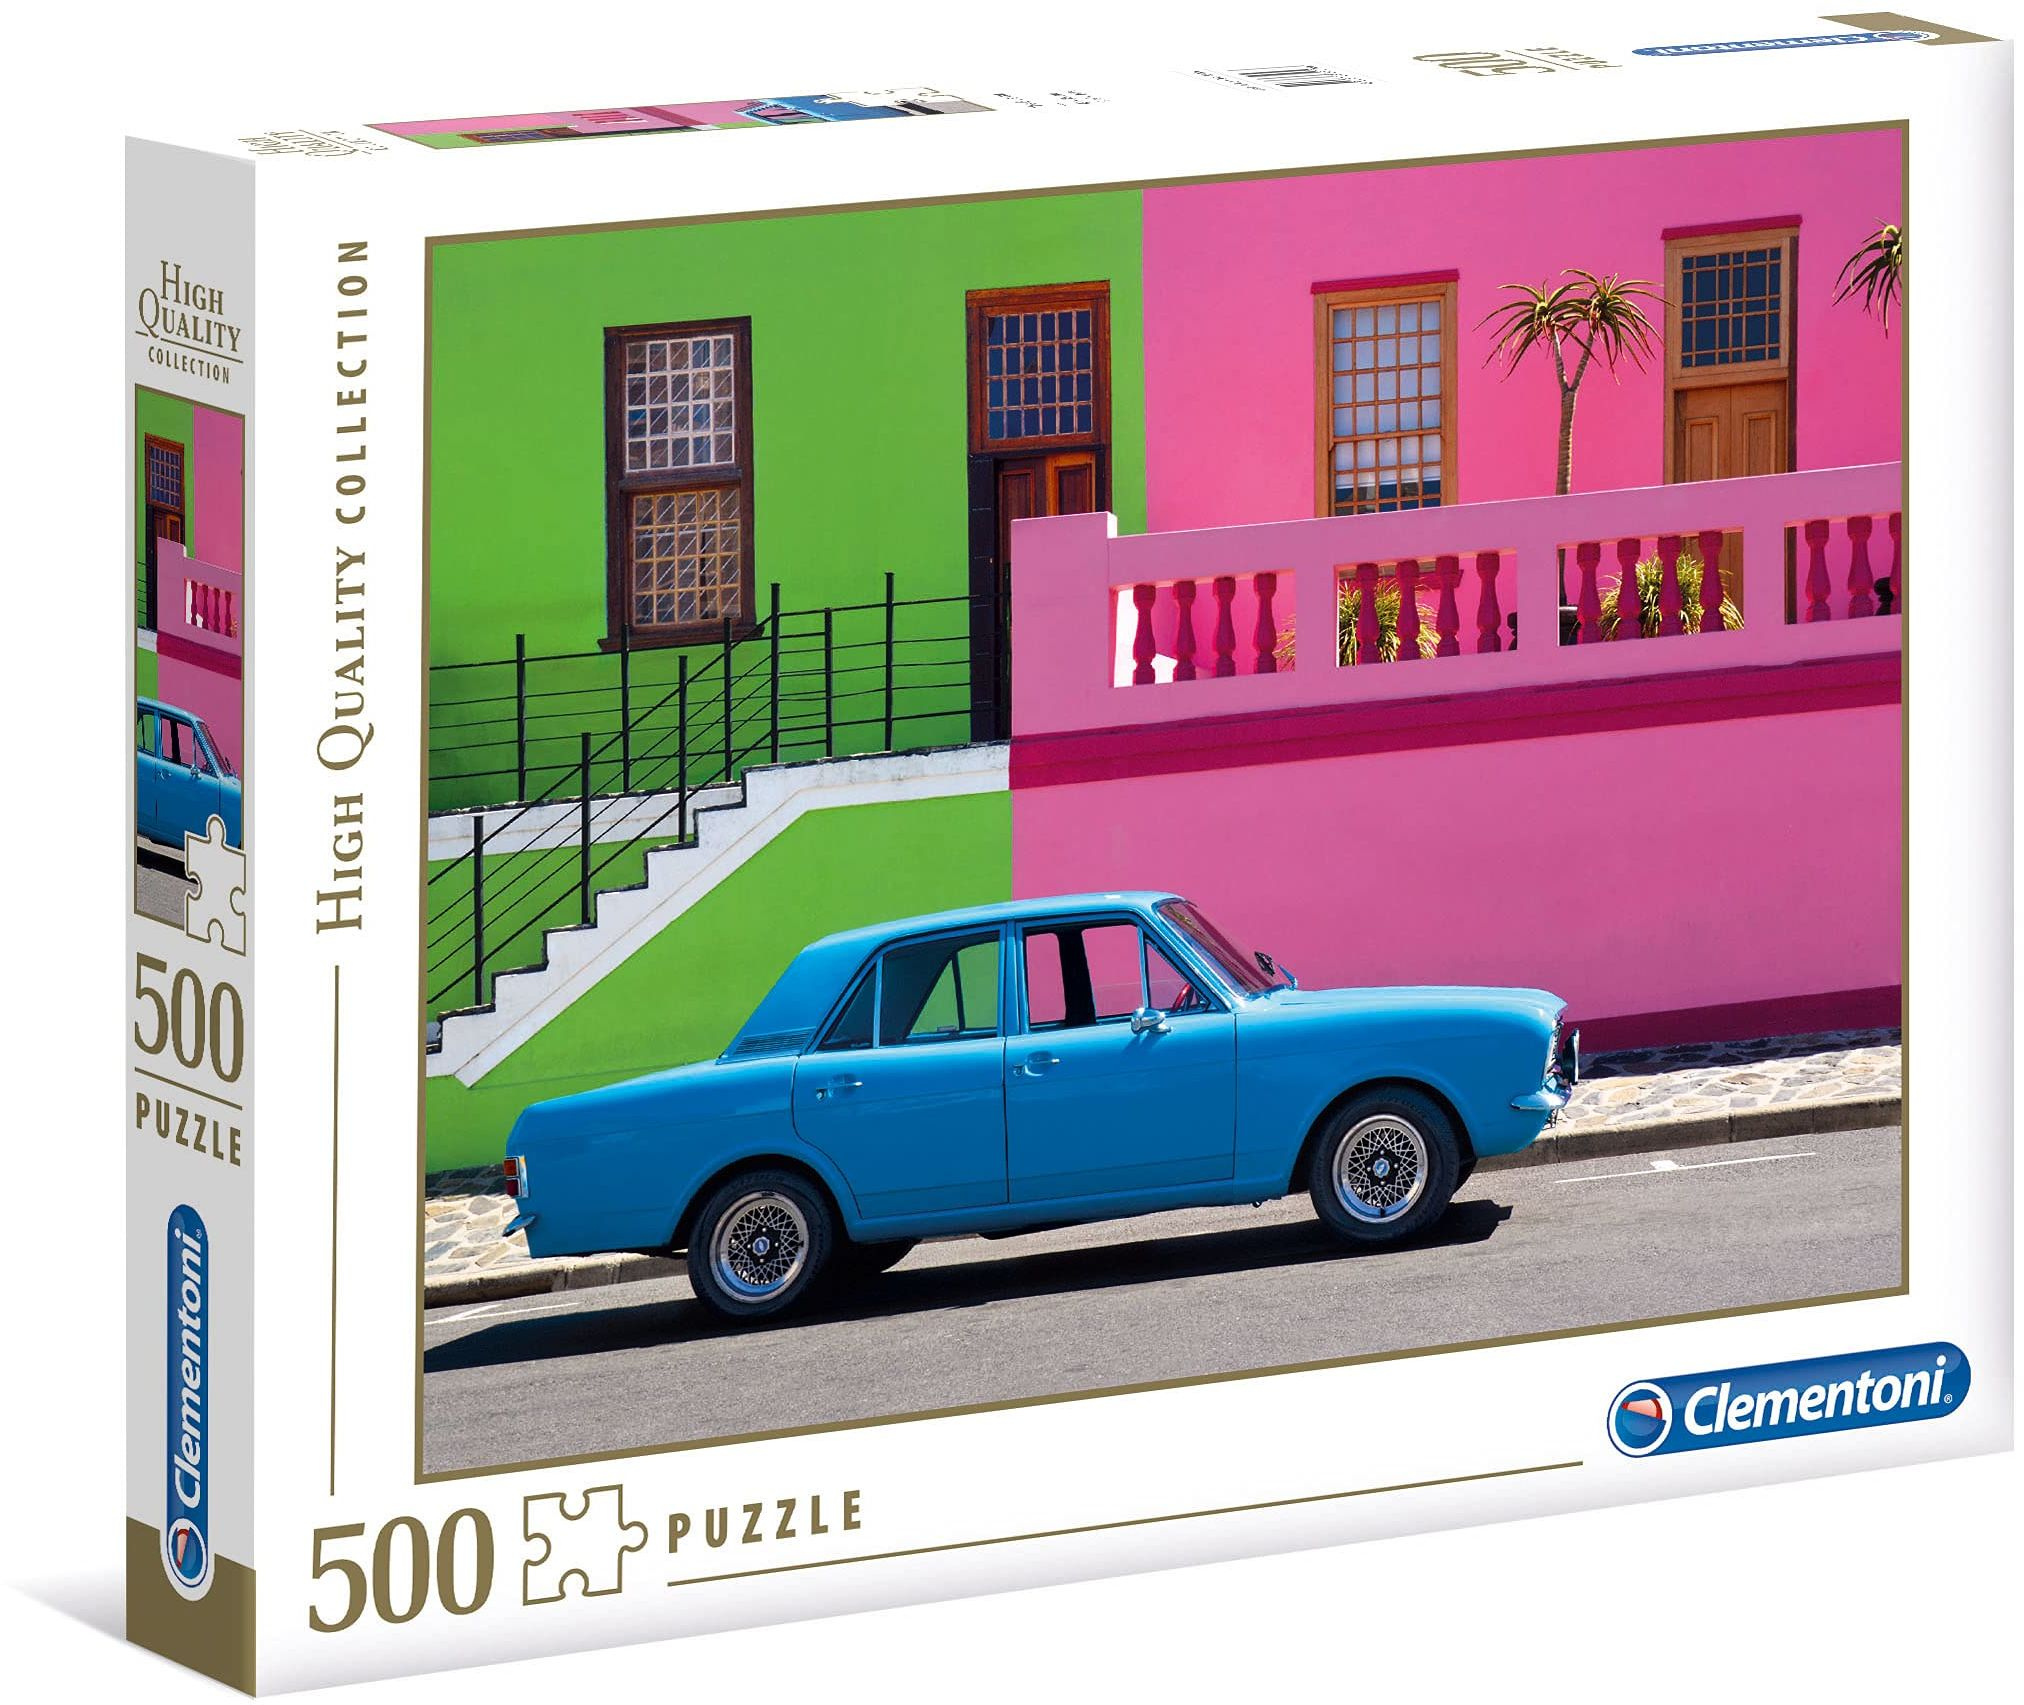 Clementoni 35076 HQC 500 szt. puzzle - niebieski samochód